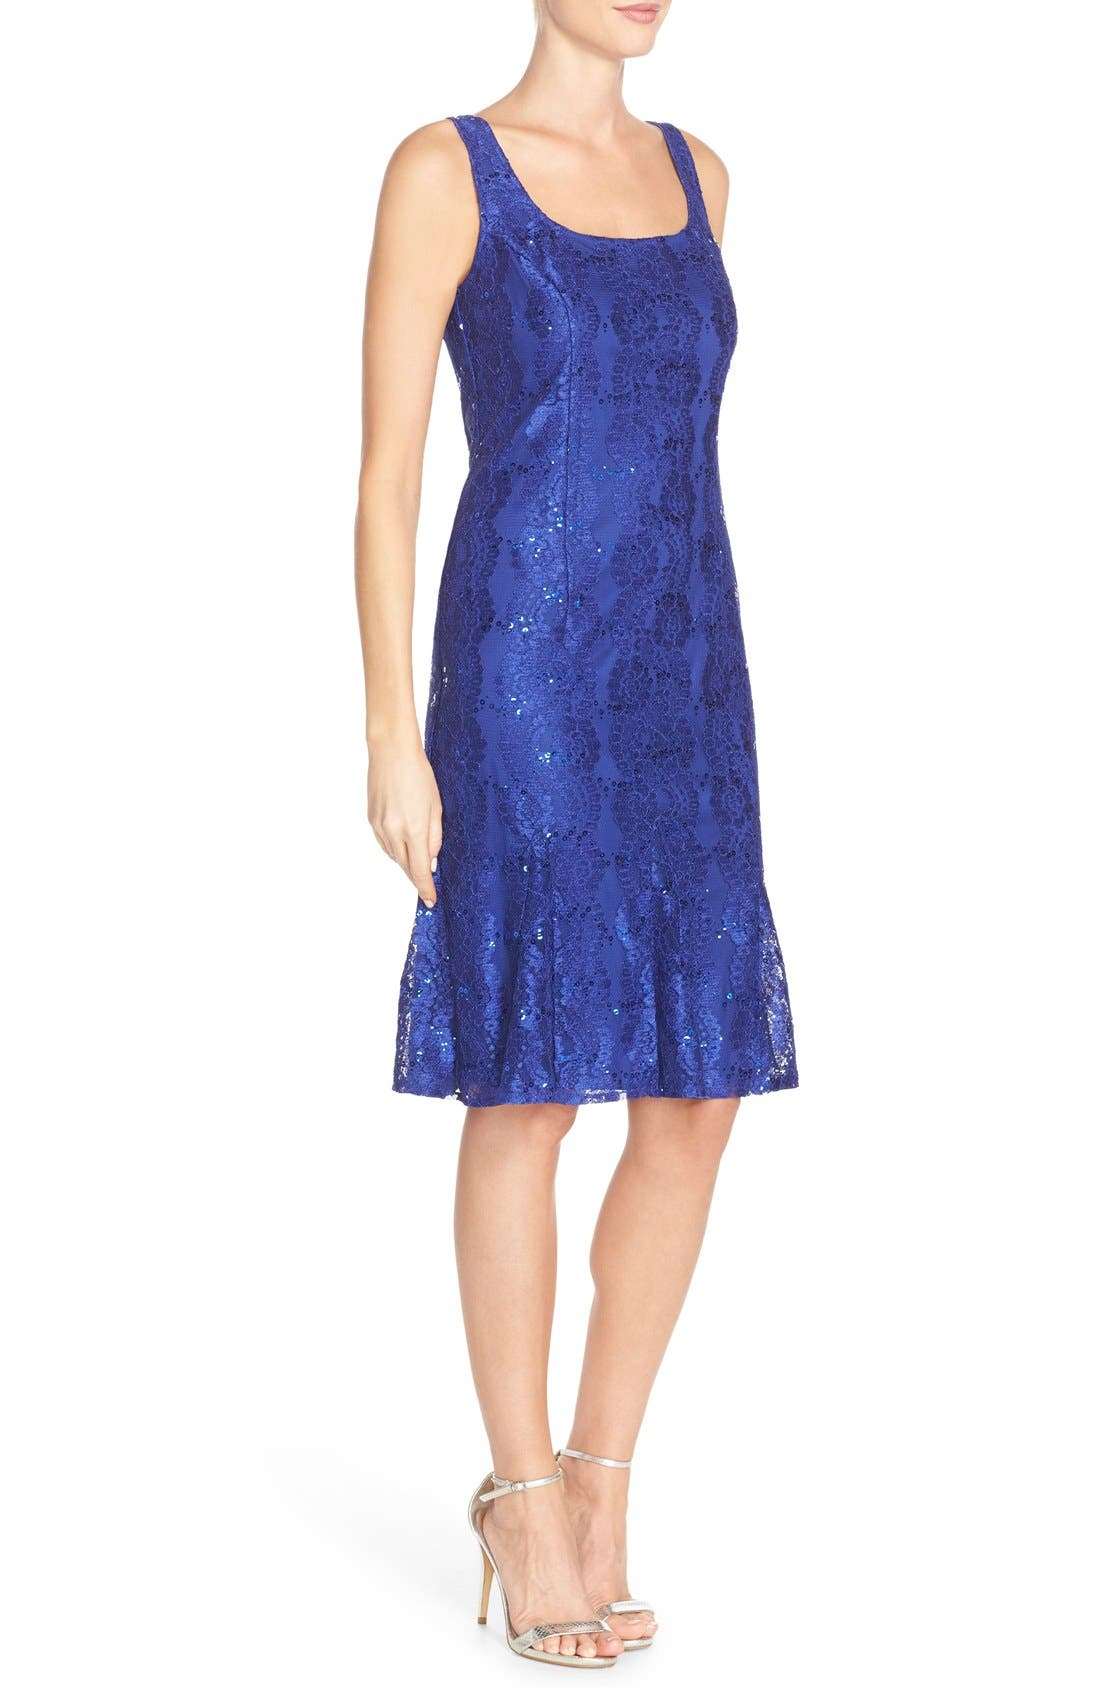 Alternate Image 3  - Alex Evenings Embellished Lace Fit & Flare Dress with Jacket